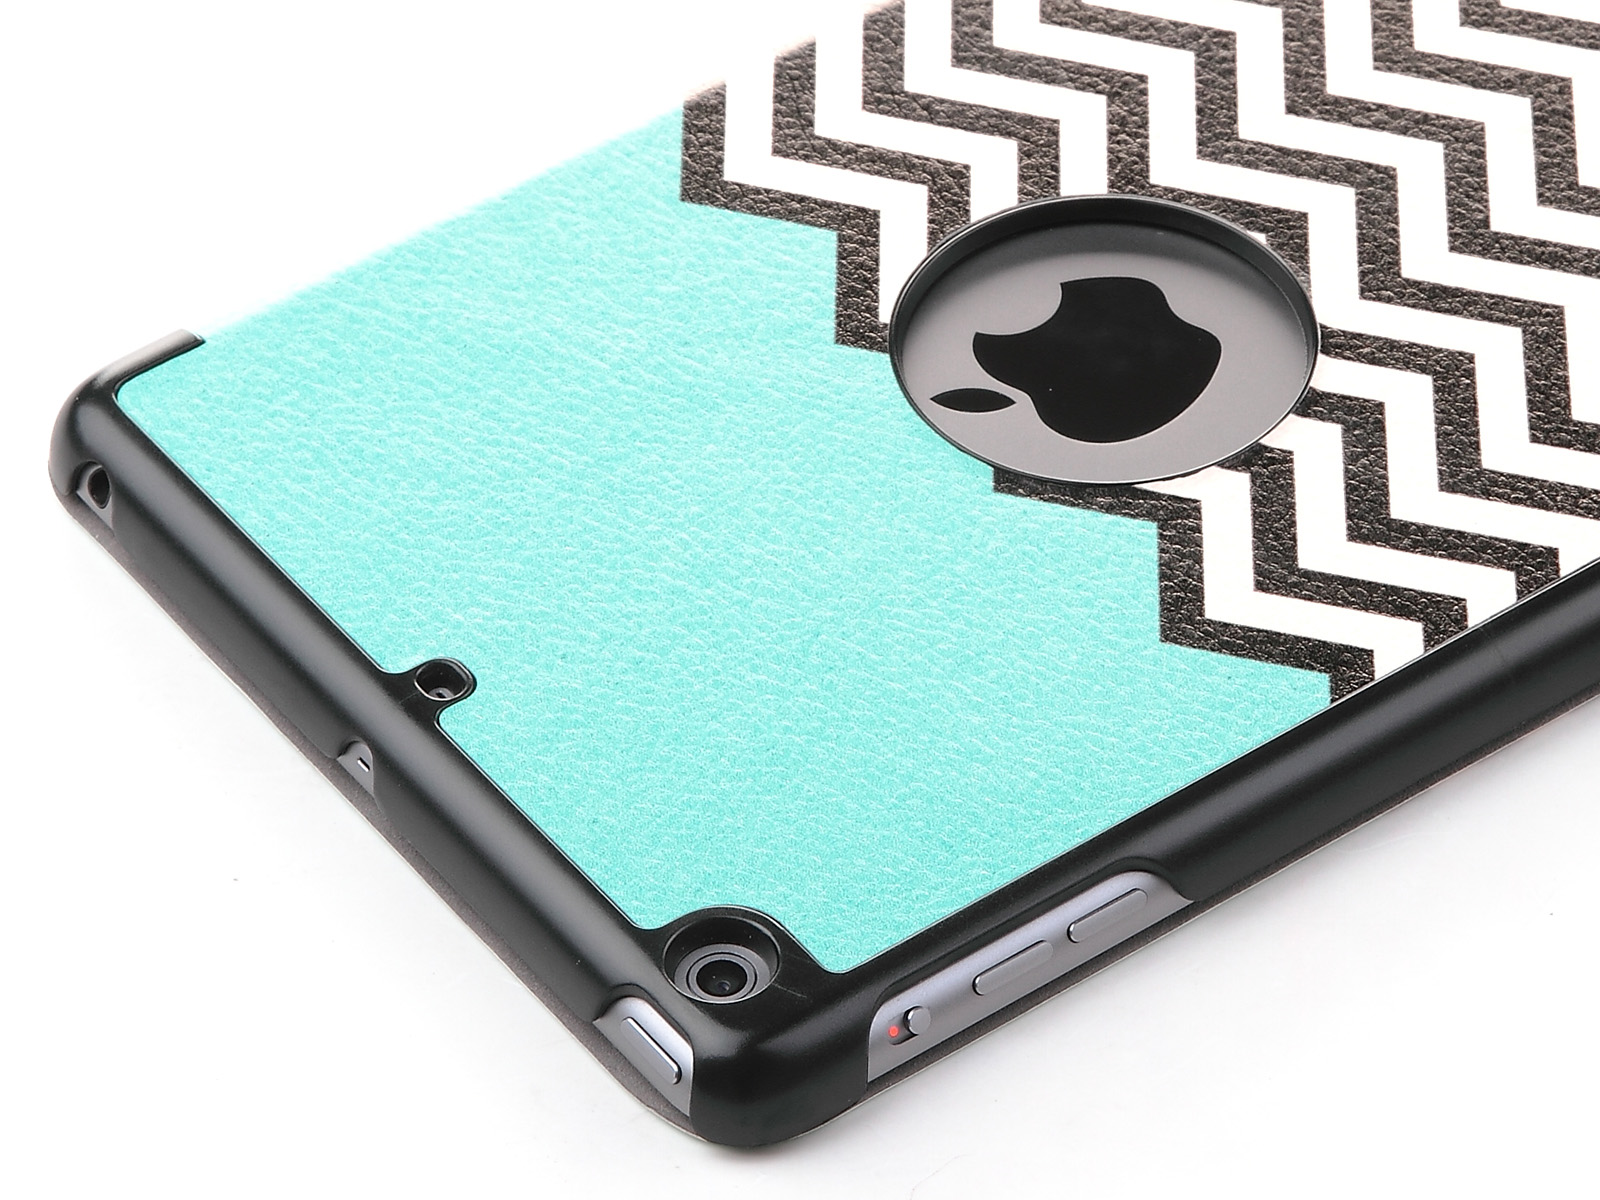 Ultra Slim Pattern PU Leather Smart Cover For Apple iPad Mini 1/2/3 Hard Case